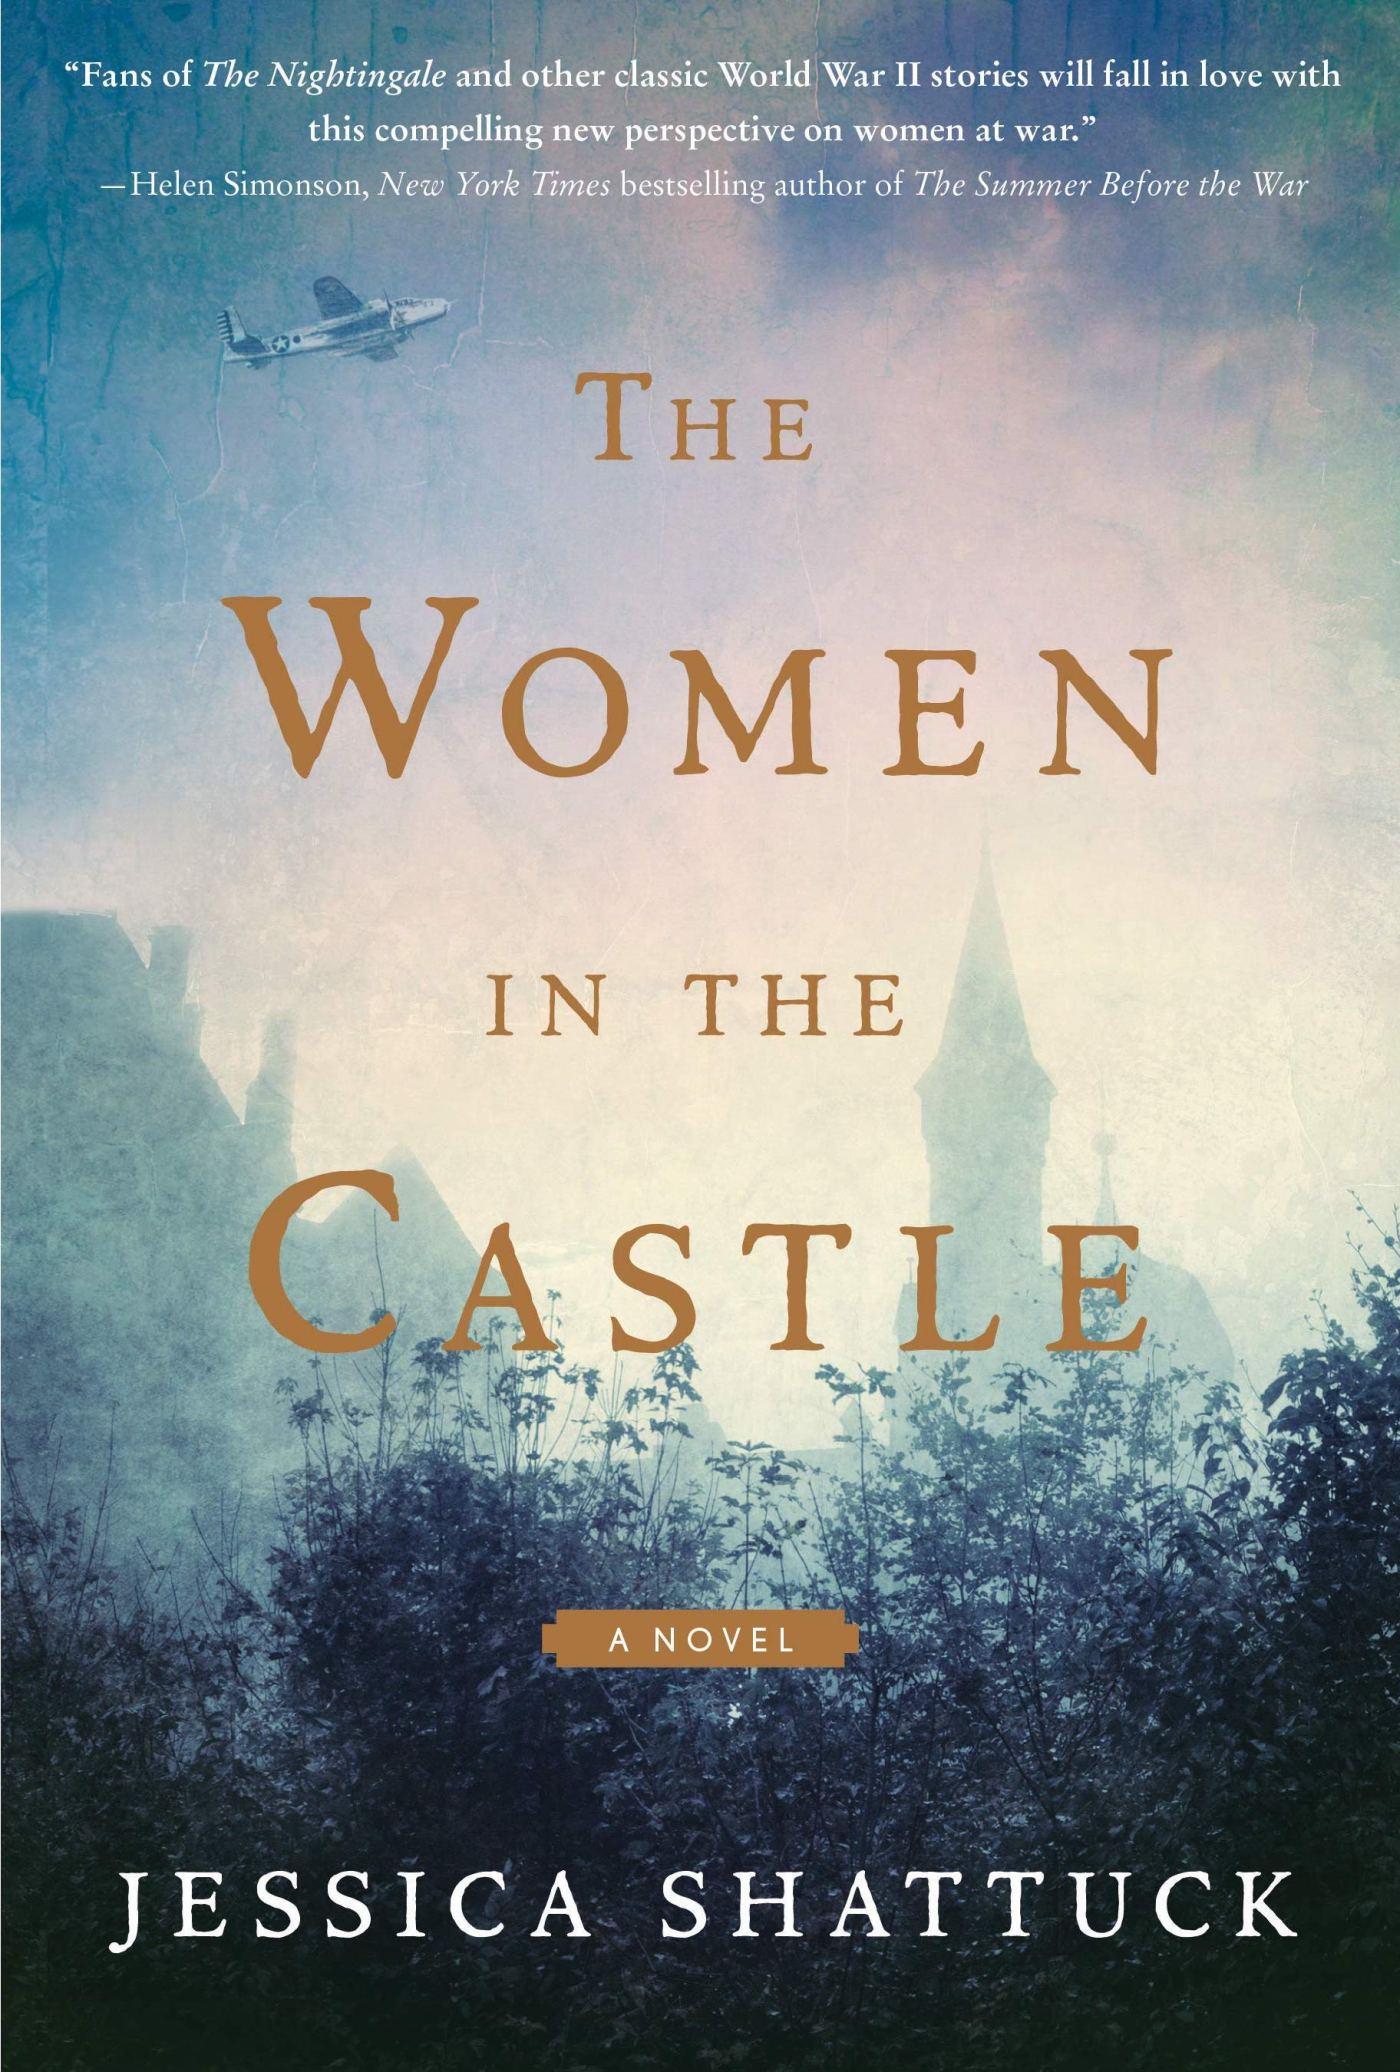 jessica shattuck - the women in the castle